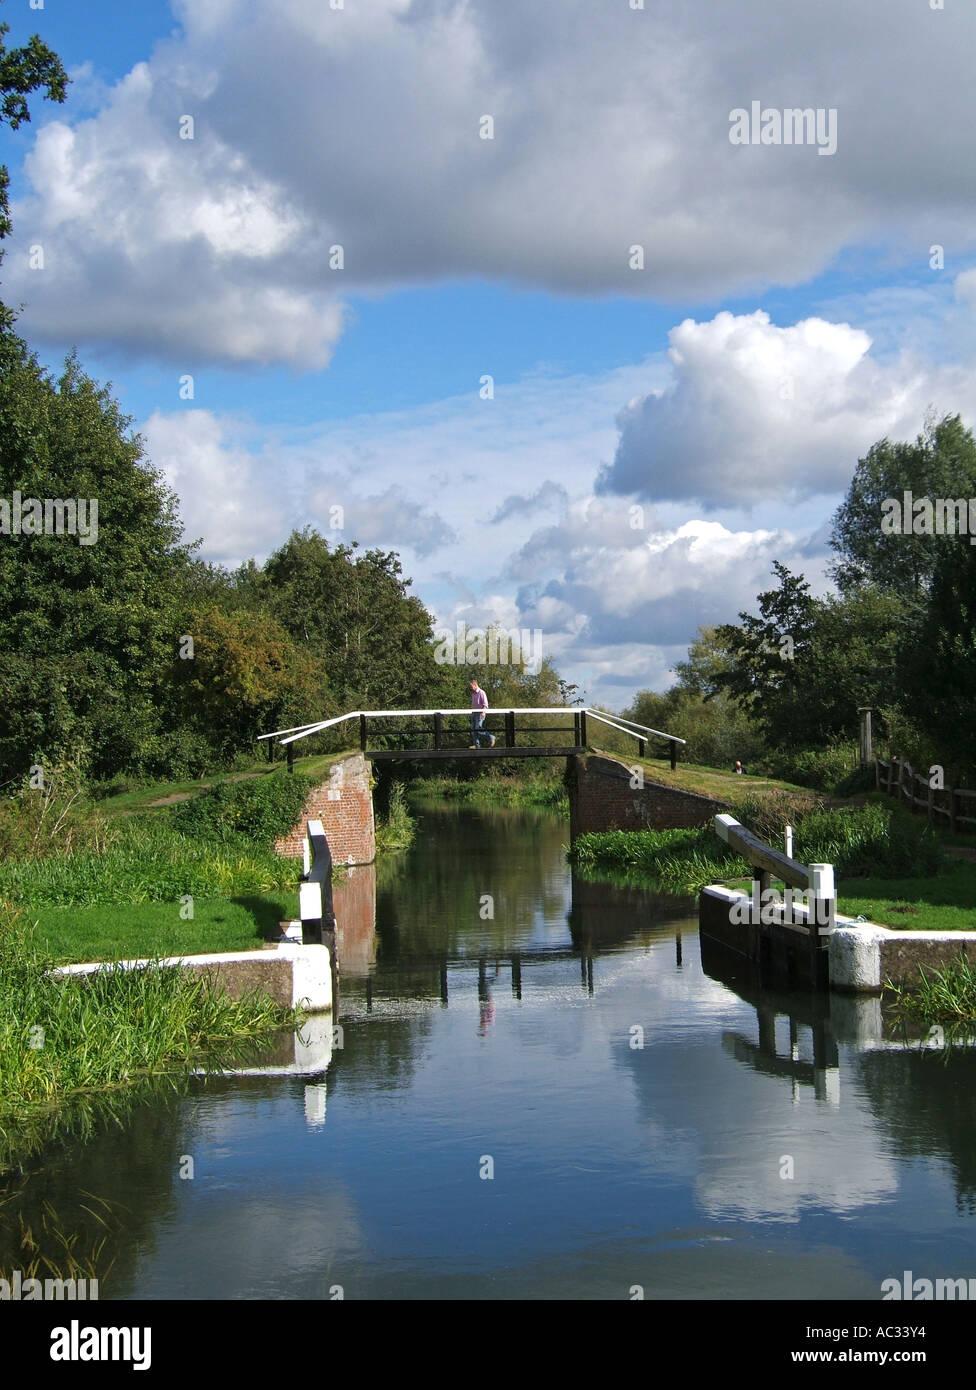 The Wey Navigations, Walsham Lock, Surrey, England - Stock Image